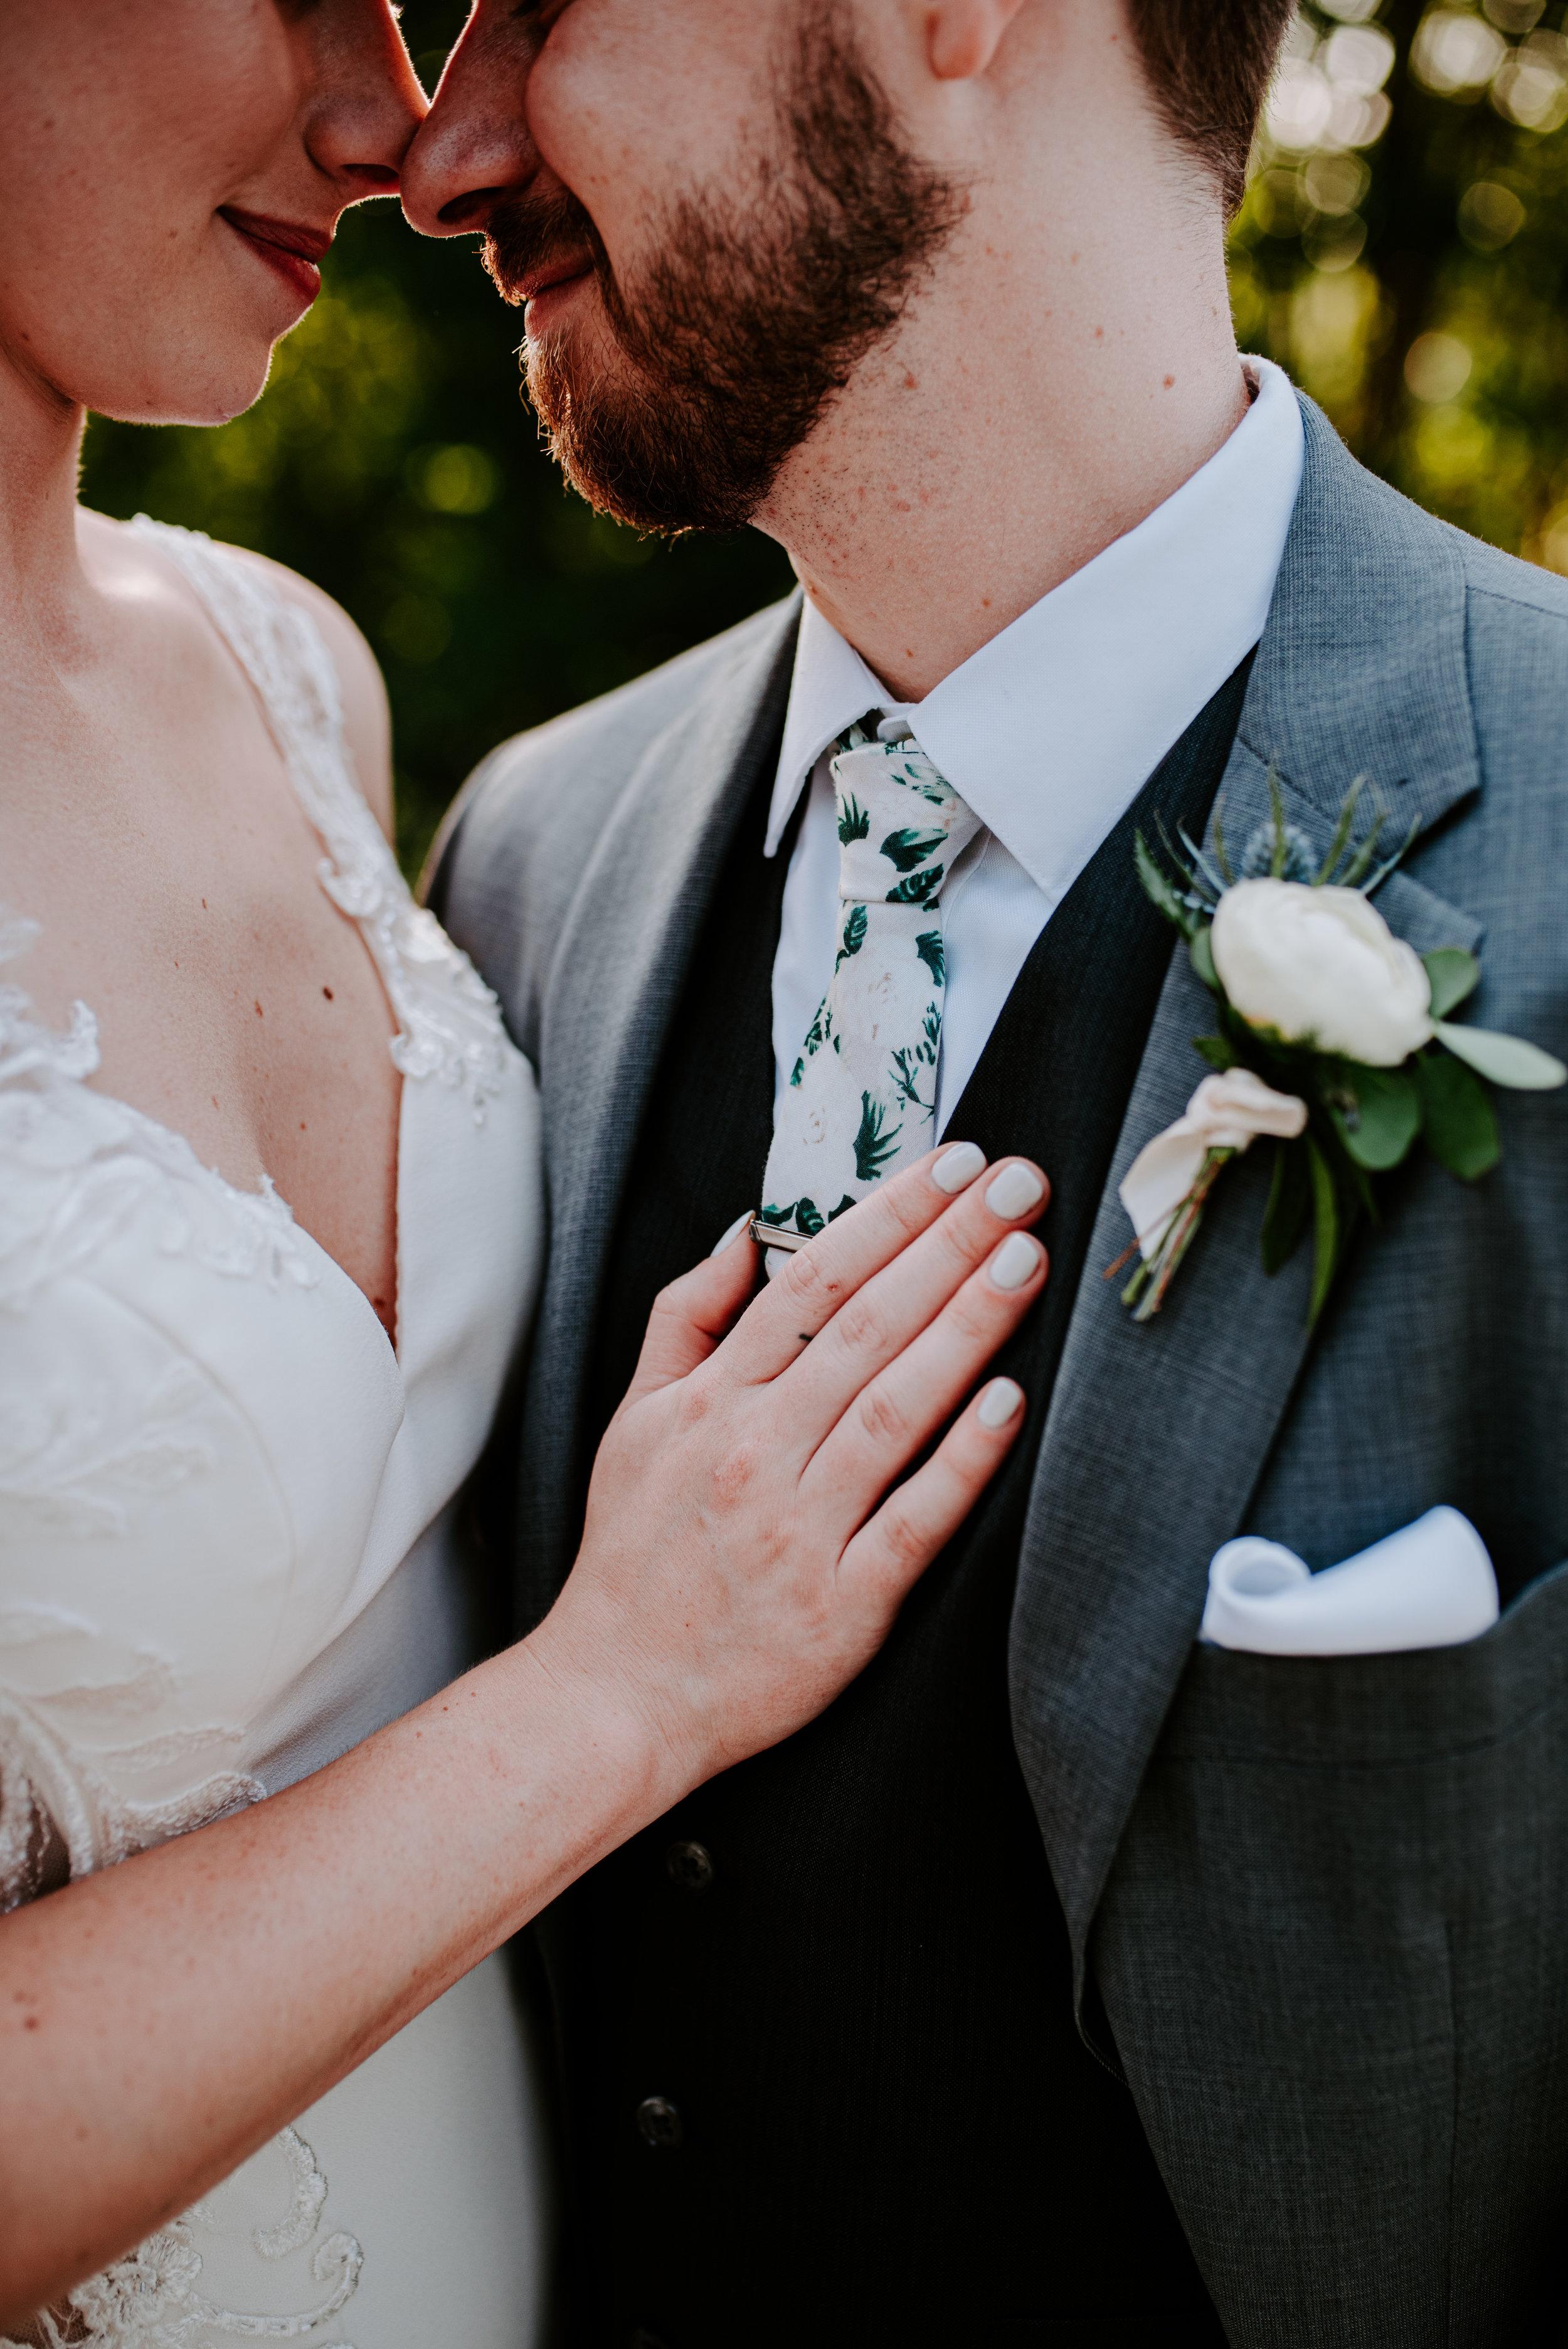 Highgrove Estate Wedding - Fuquay Varina Wedding Photographer - Triangle Wedding Photographer - North Carolina Wedding Photographer